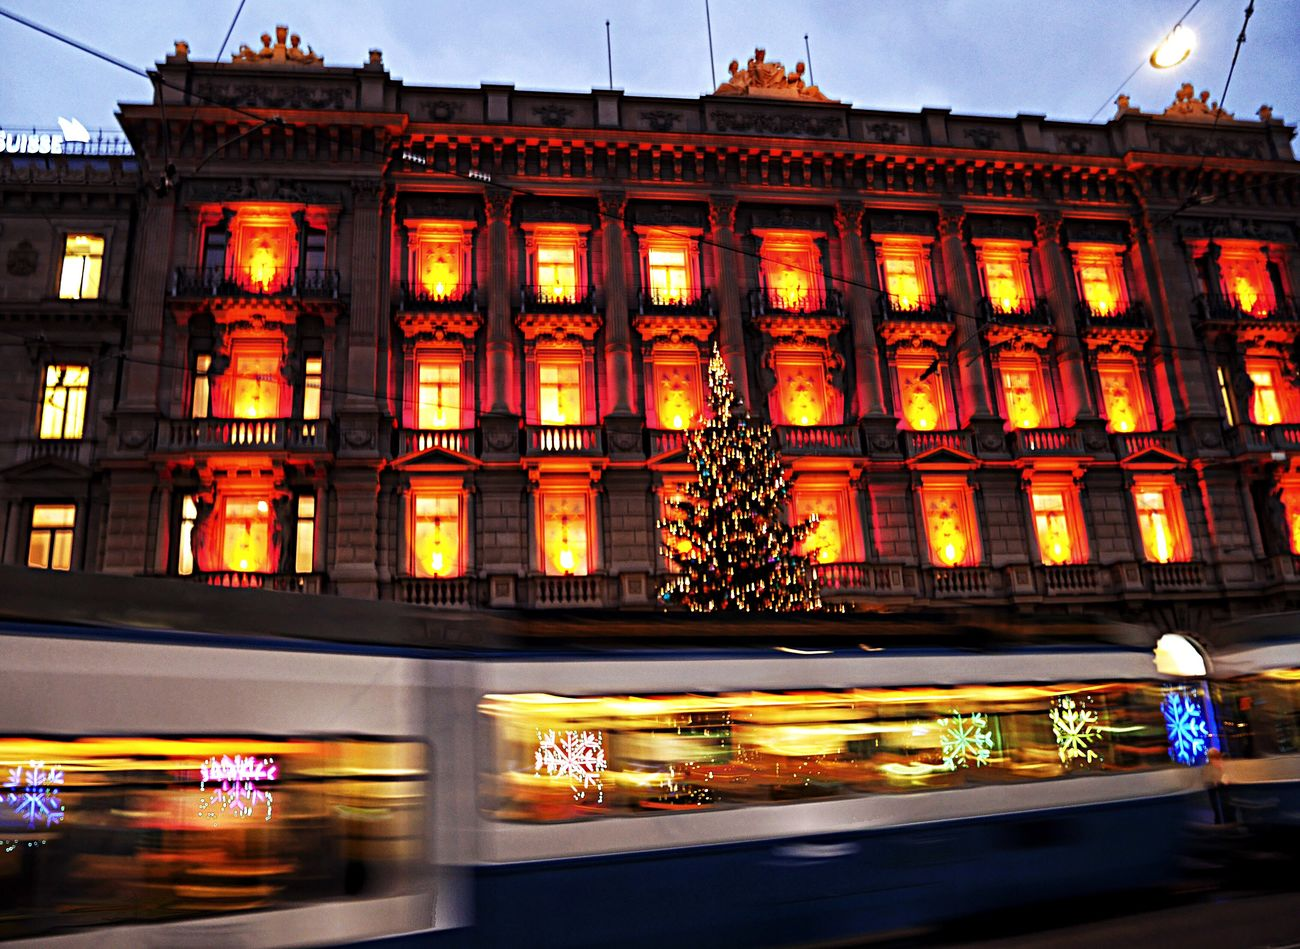 Lights EyeEm Best Shots Berlin - Zürich Transcience Streetphoto Street Photography Street Streetphotography